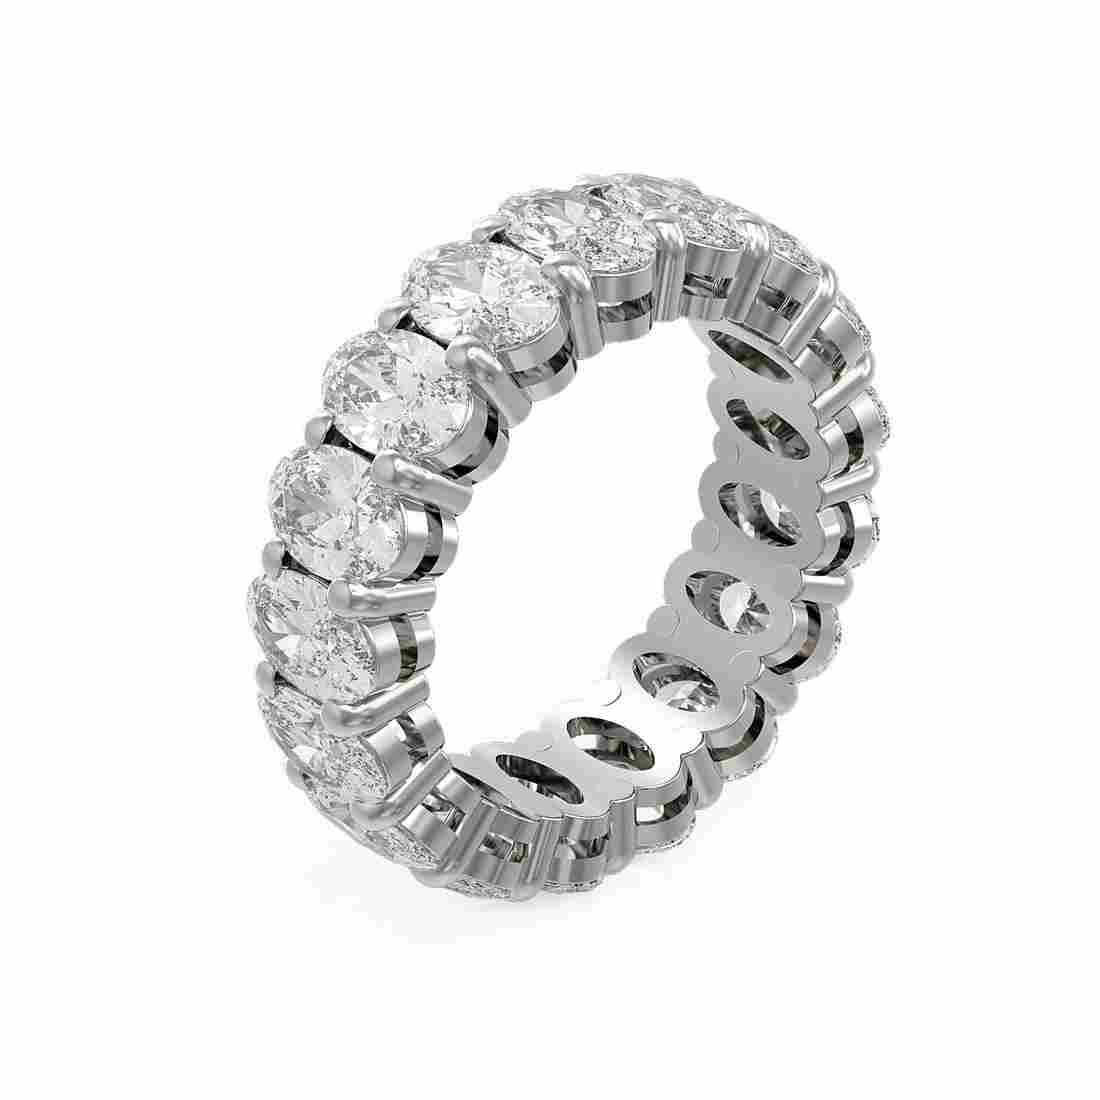 8.84 ctw Oval Diamond Ring 18K White Gold - REF-1556F8M